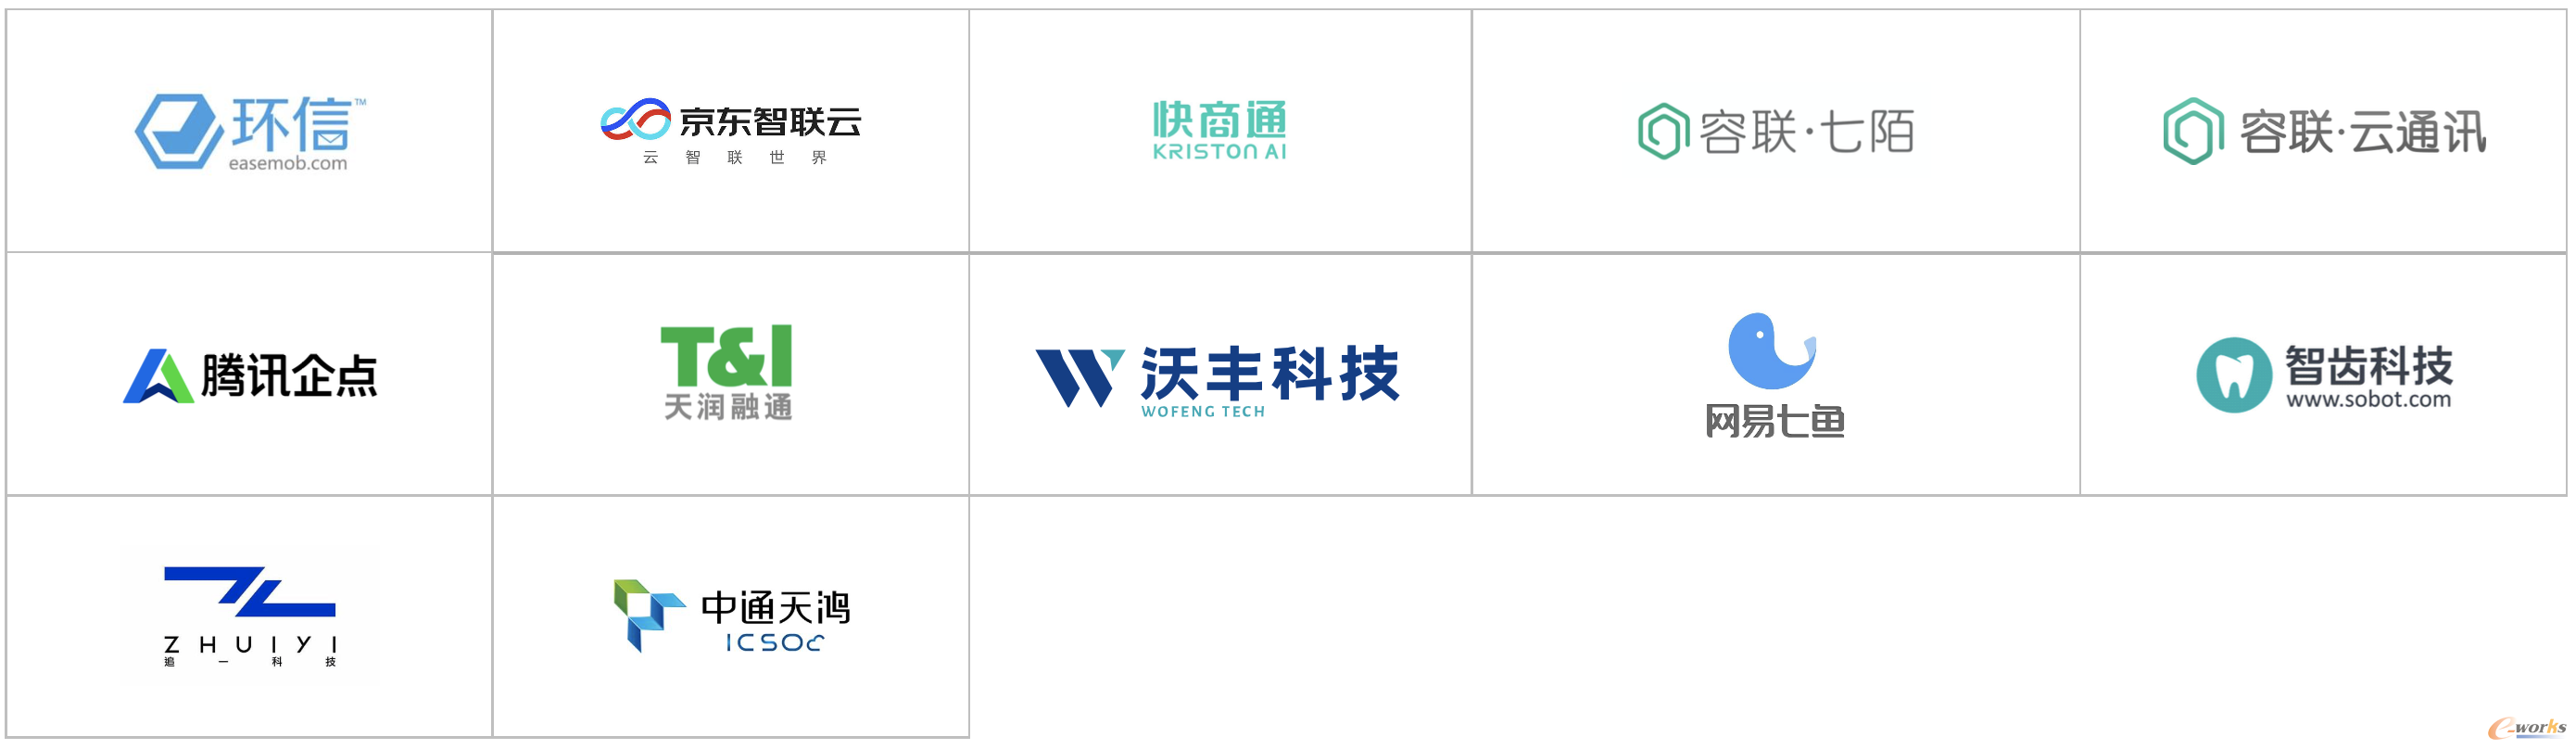 http://www.e-works.net.cn/News/articleimage/202012/132512895377200350_new.png